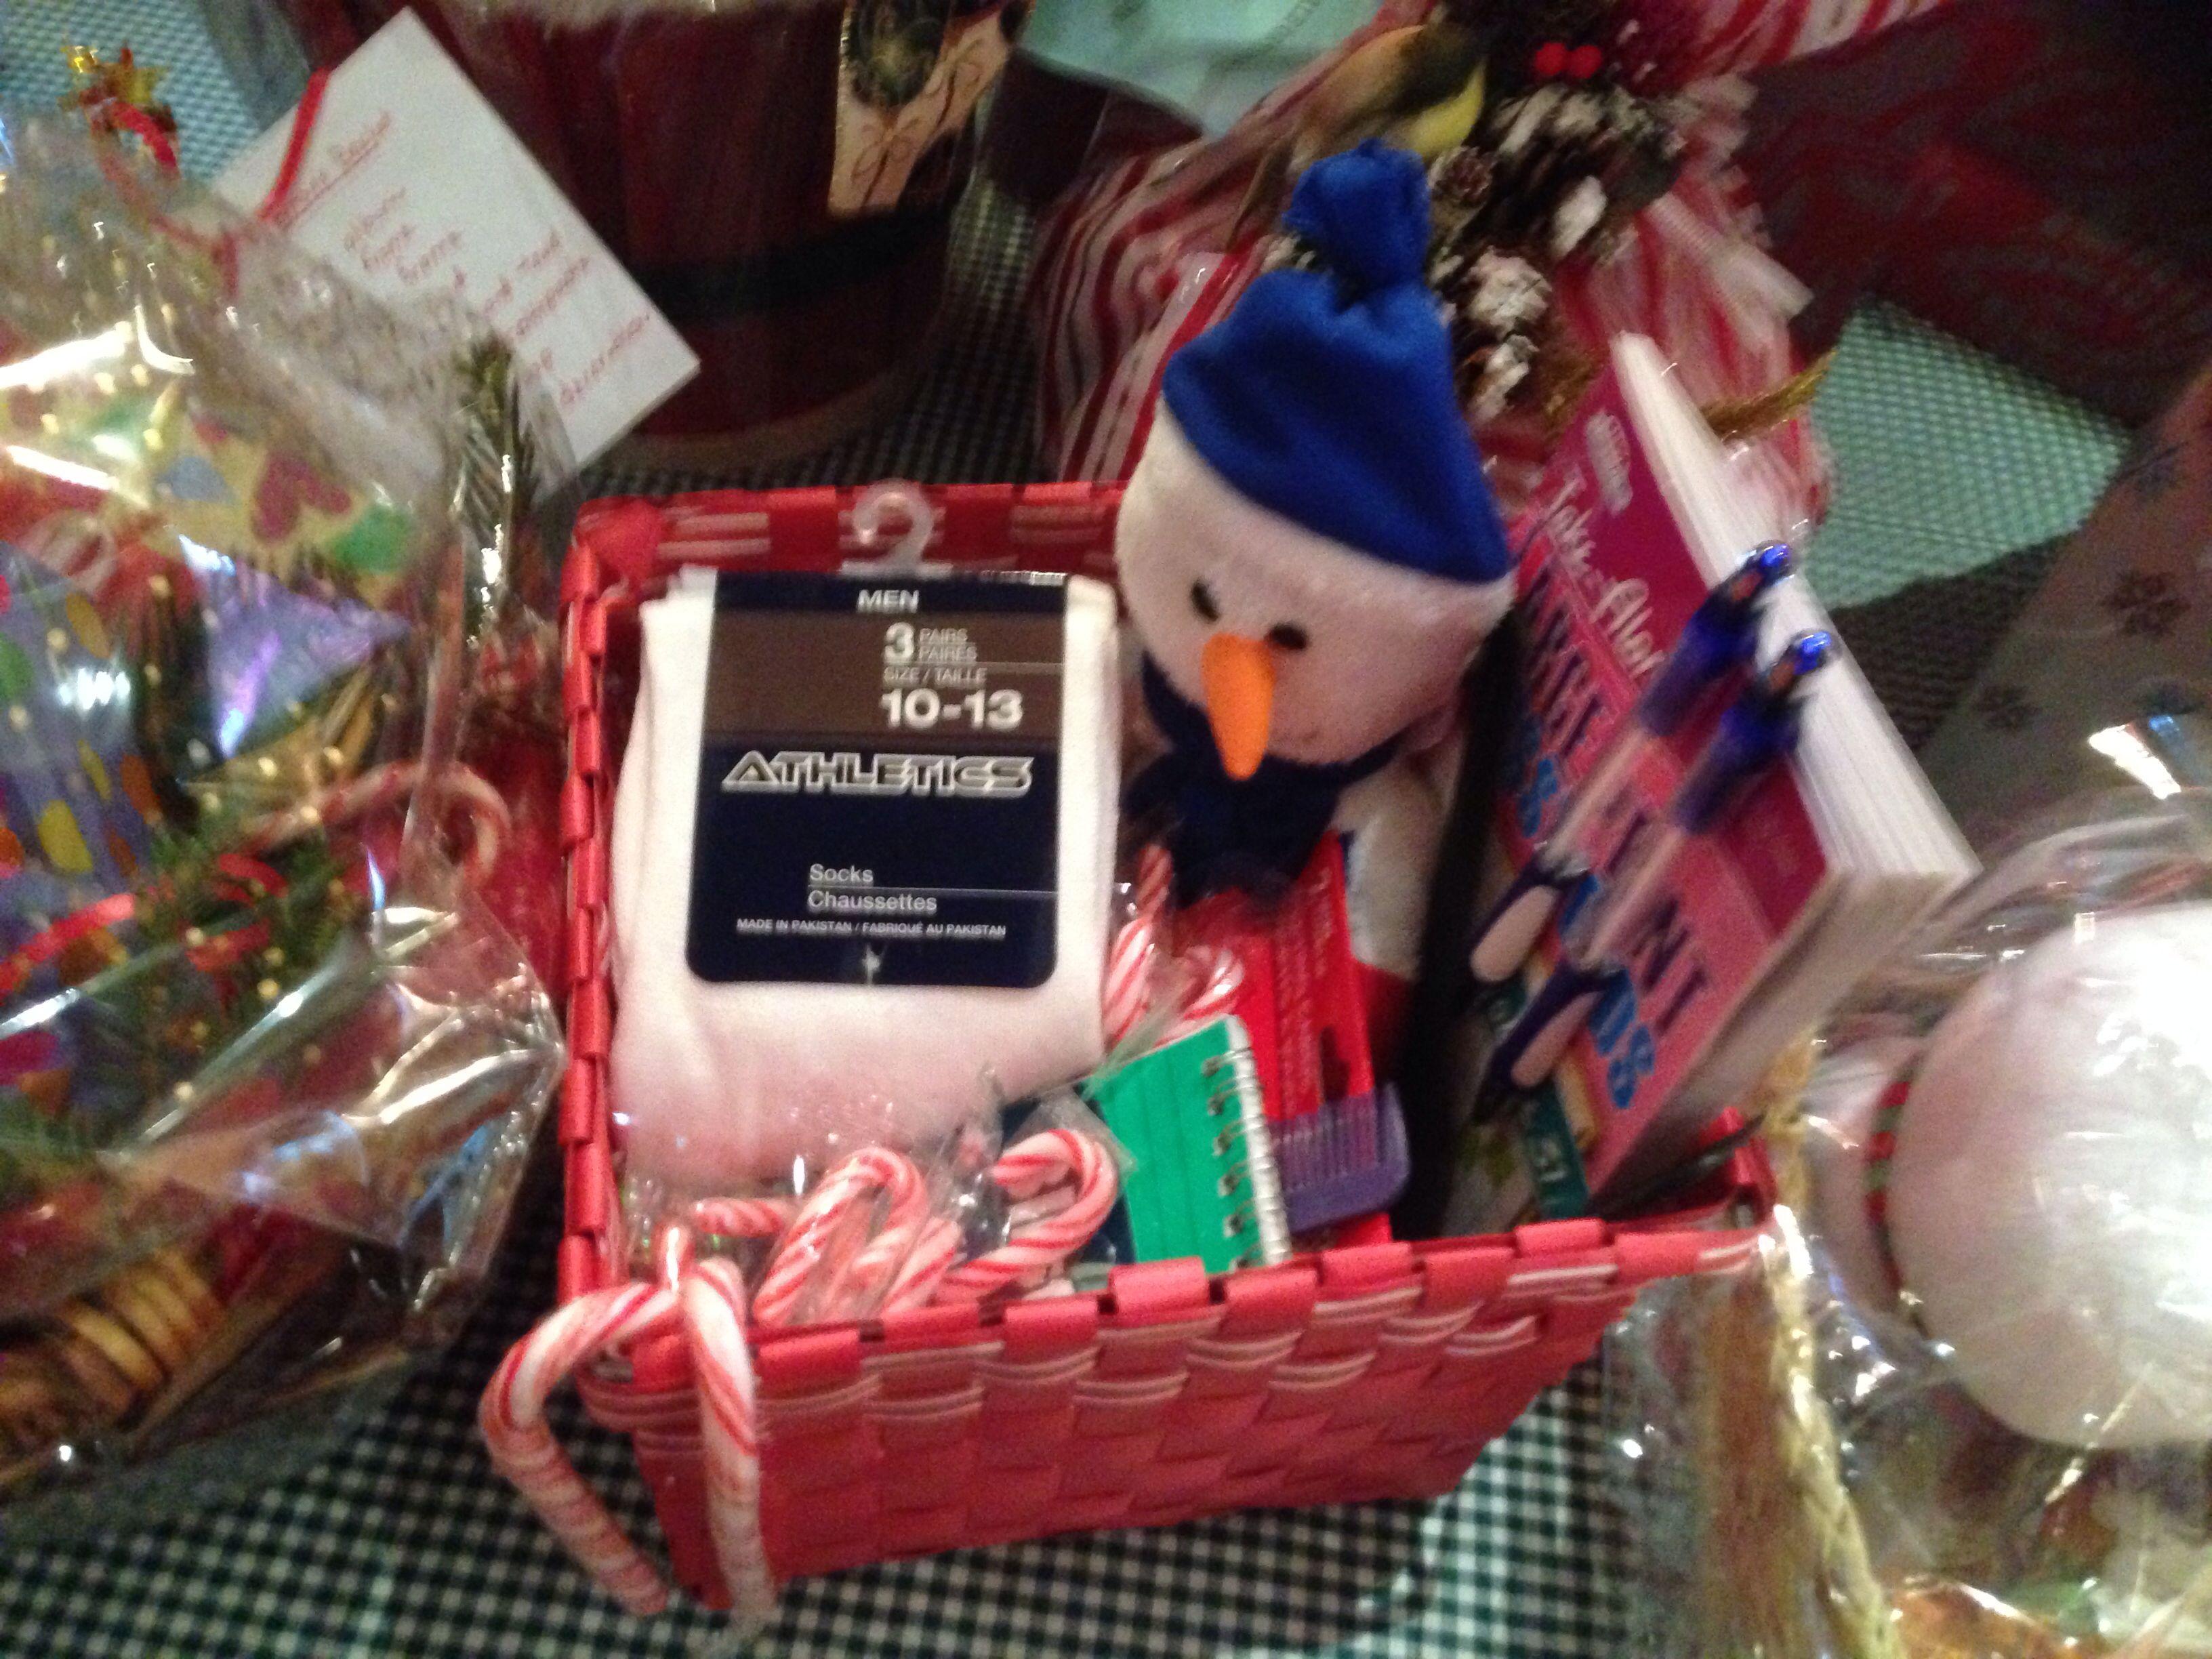 Basket for Nursing Home recipient Nursing home gifts